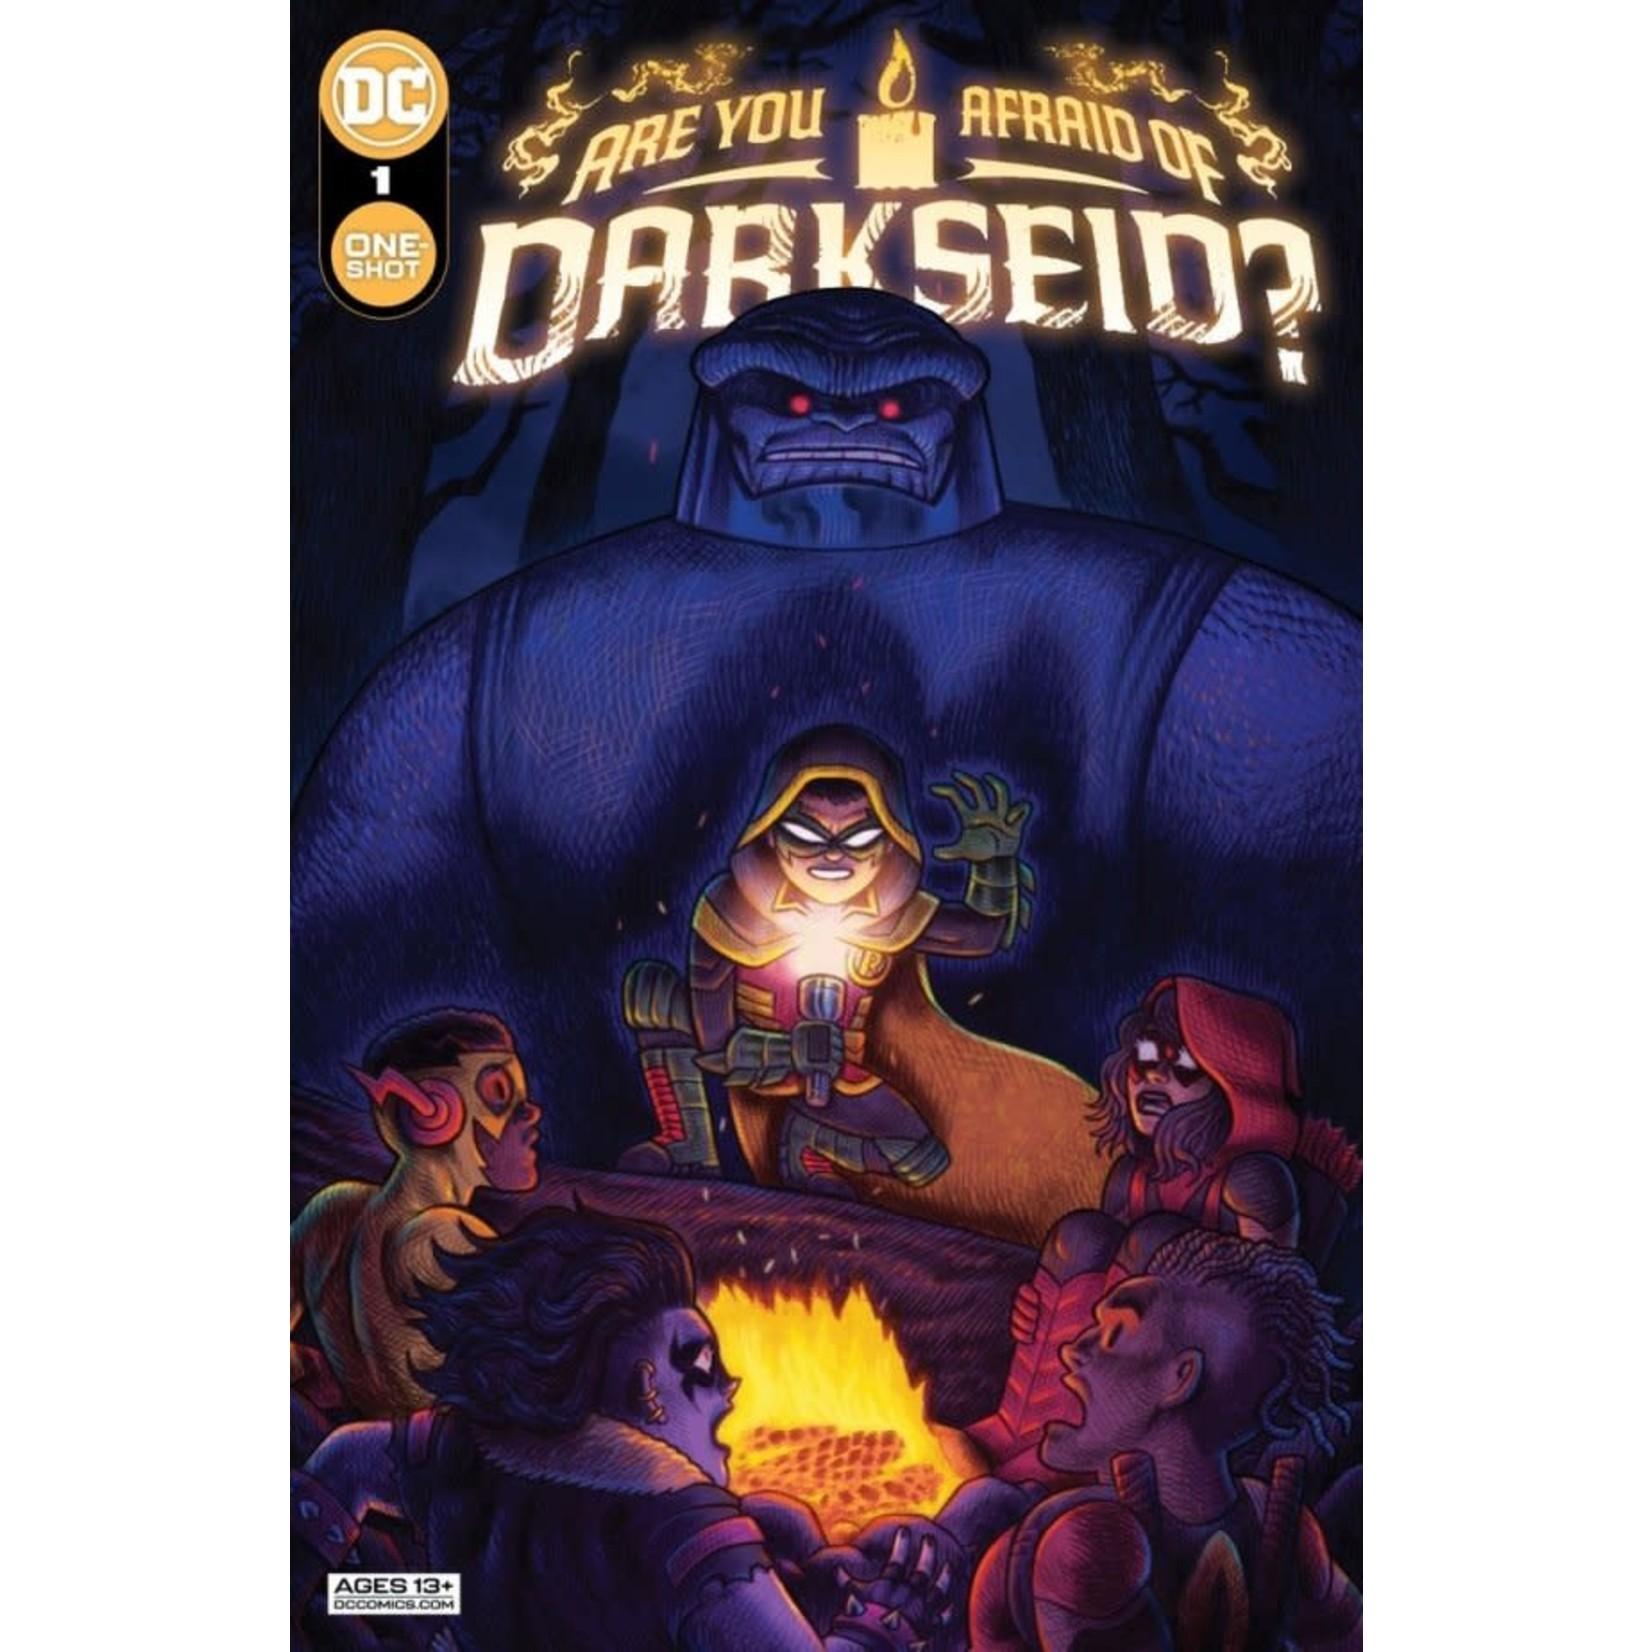 DC Comics Are You Afraid of Darkseid? #1